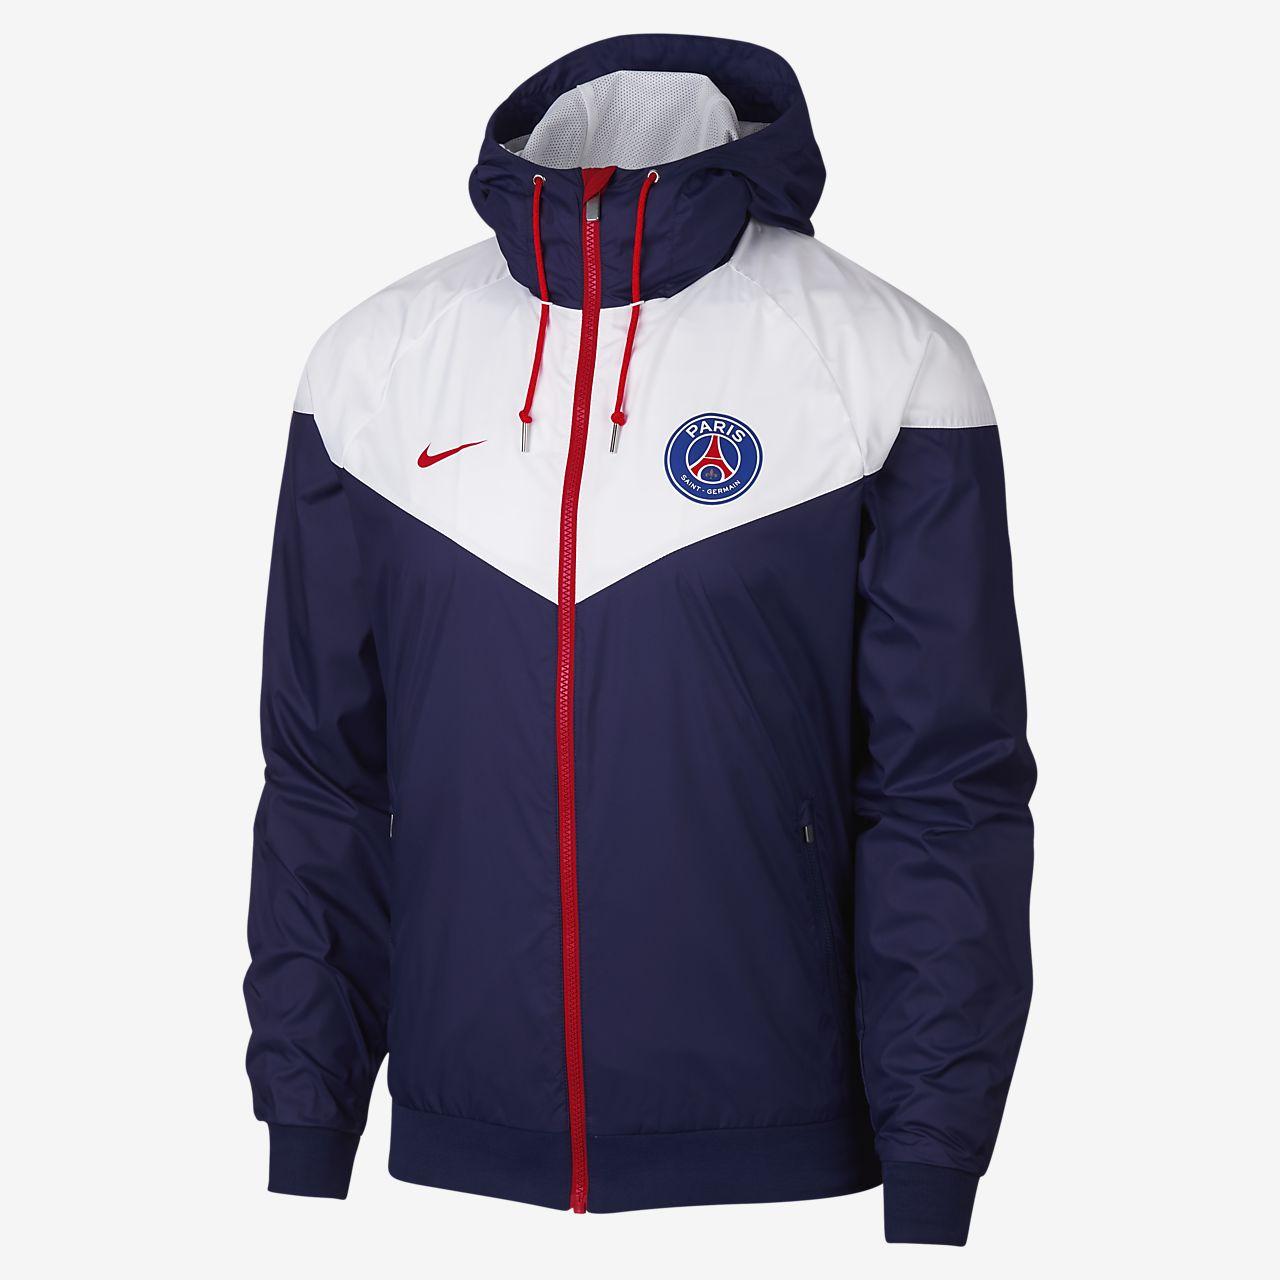 74d784d2bb Paris Saint-Germain Windrunner Men s Jacket. Nike.com AT